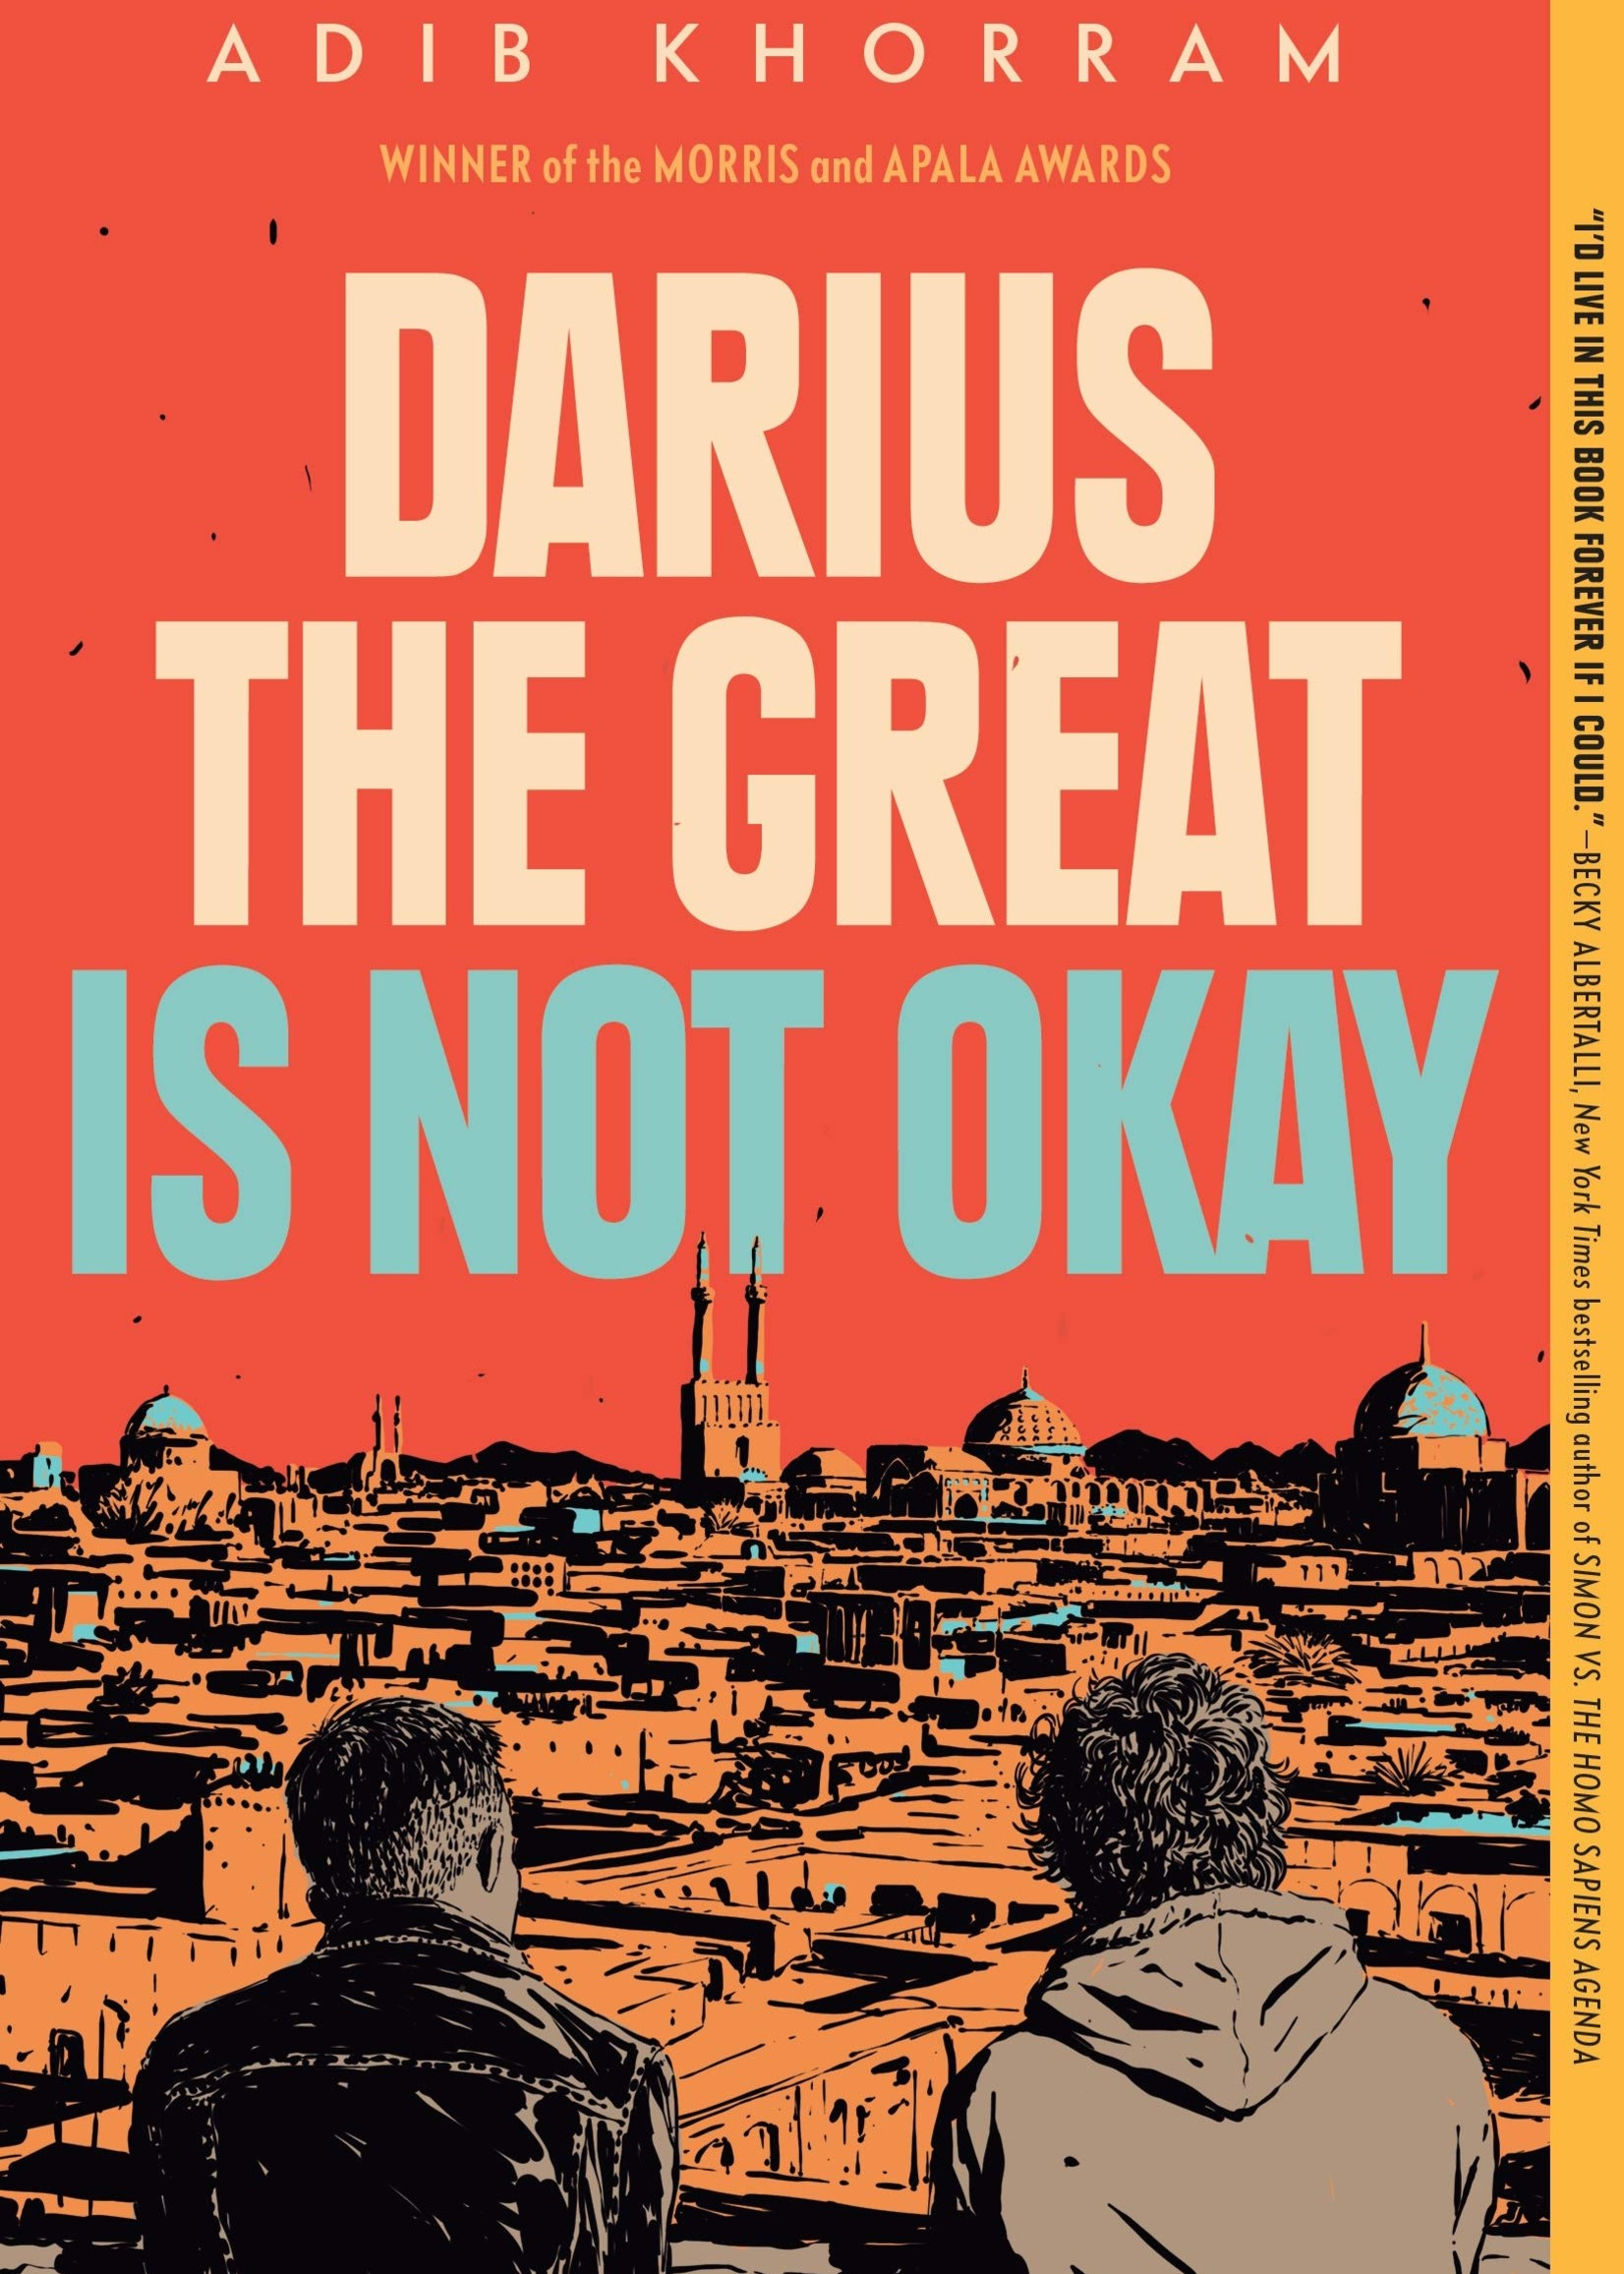 Darius the Great Is Not Okay - Paperback